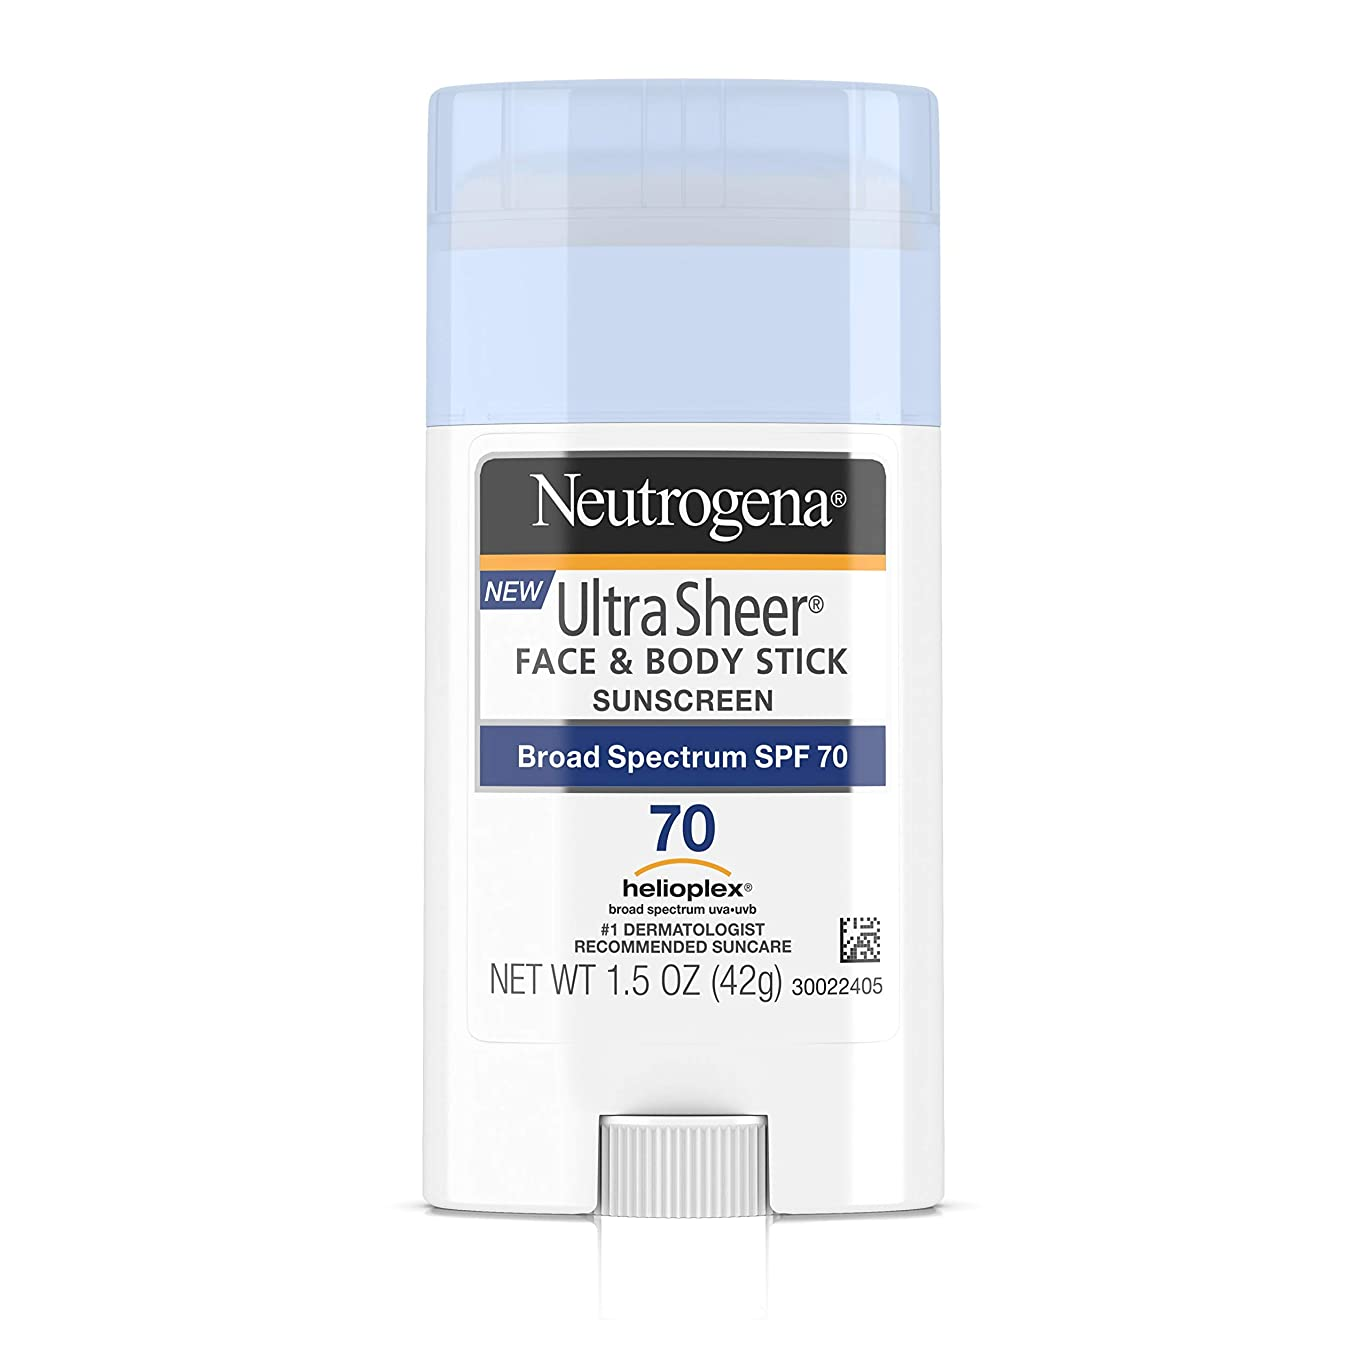 Neutrogena Ultra Sheer Non-Greasy Sunscreen Stick for Face & Body, Broad Spectrum SPF 70, 1.5 oz